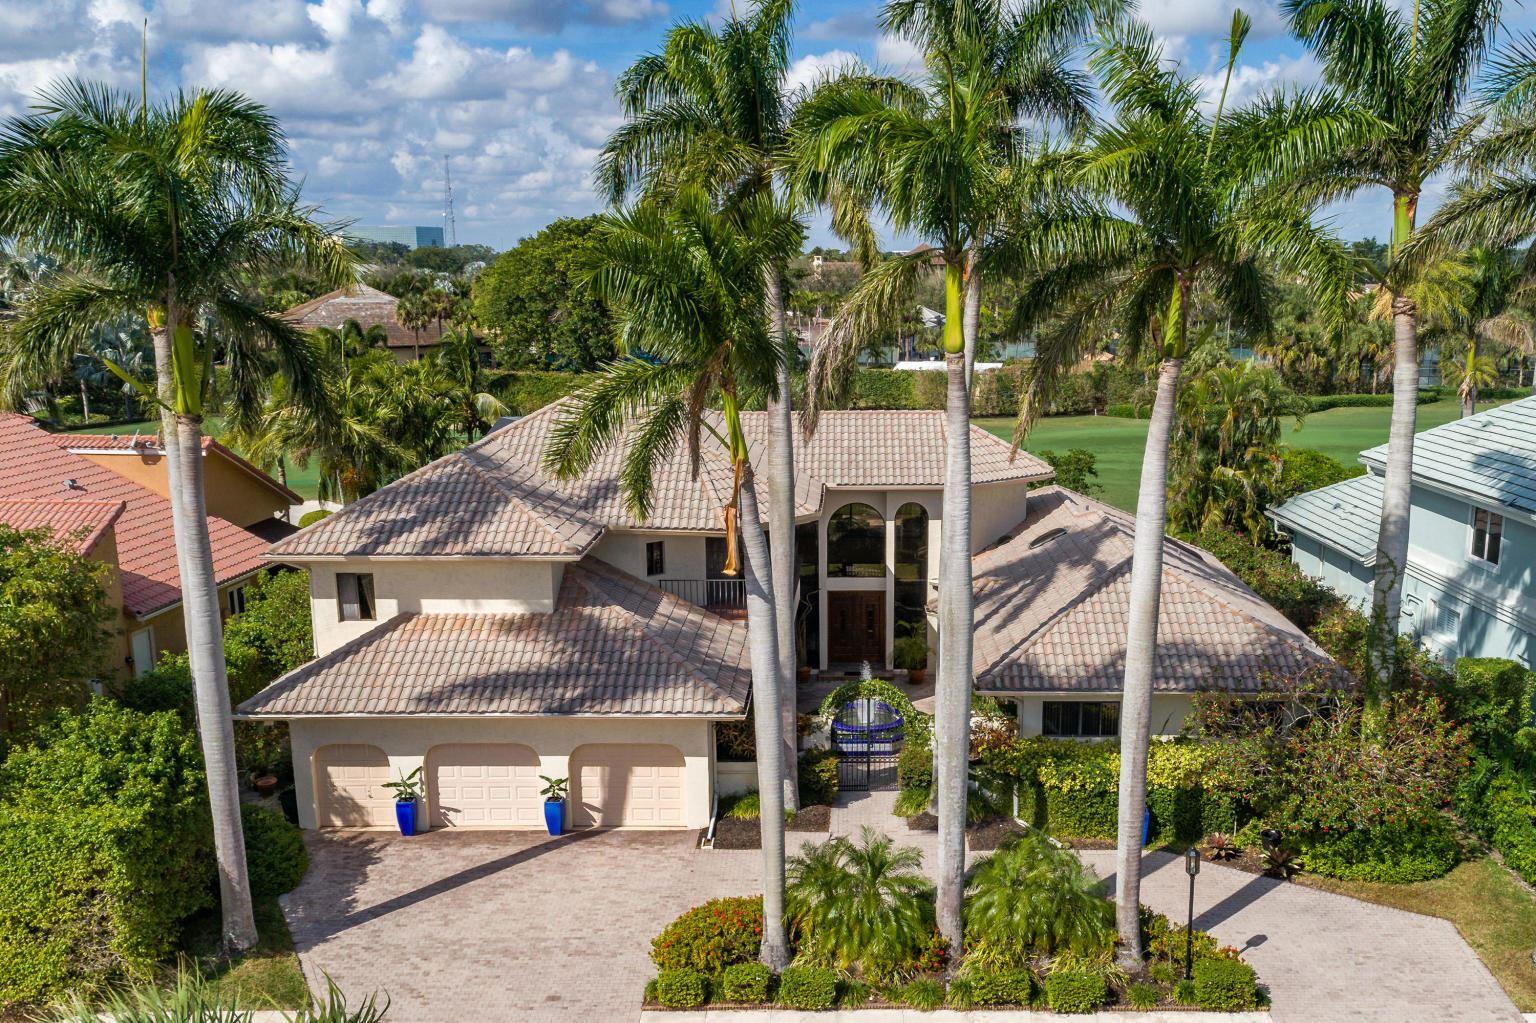 7339 Mandarin Drive, Boca Raton, FL 33433 - #: RX-10639418